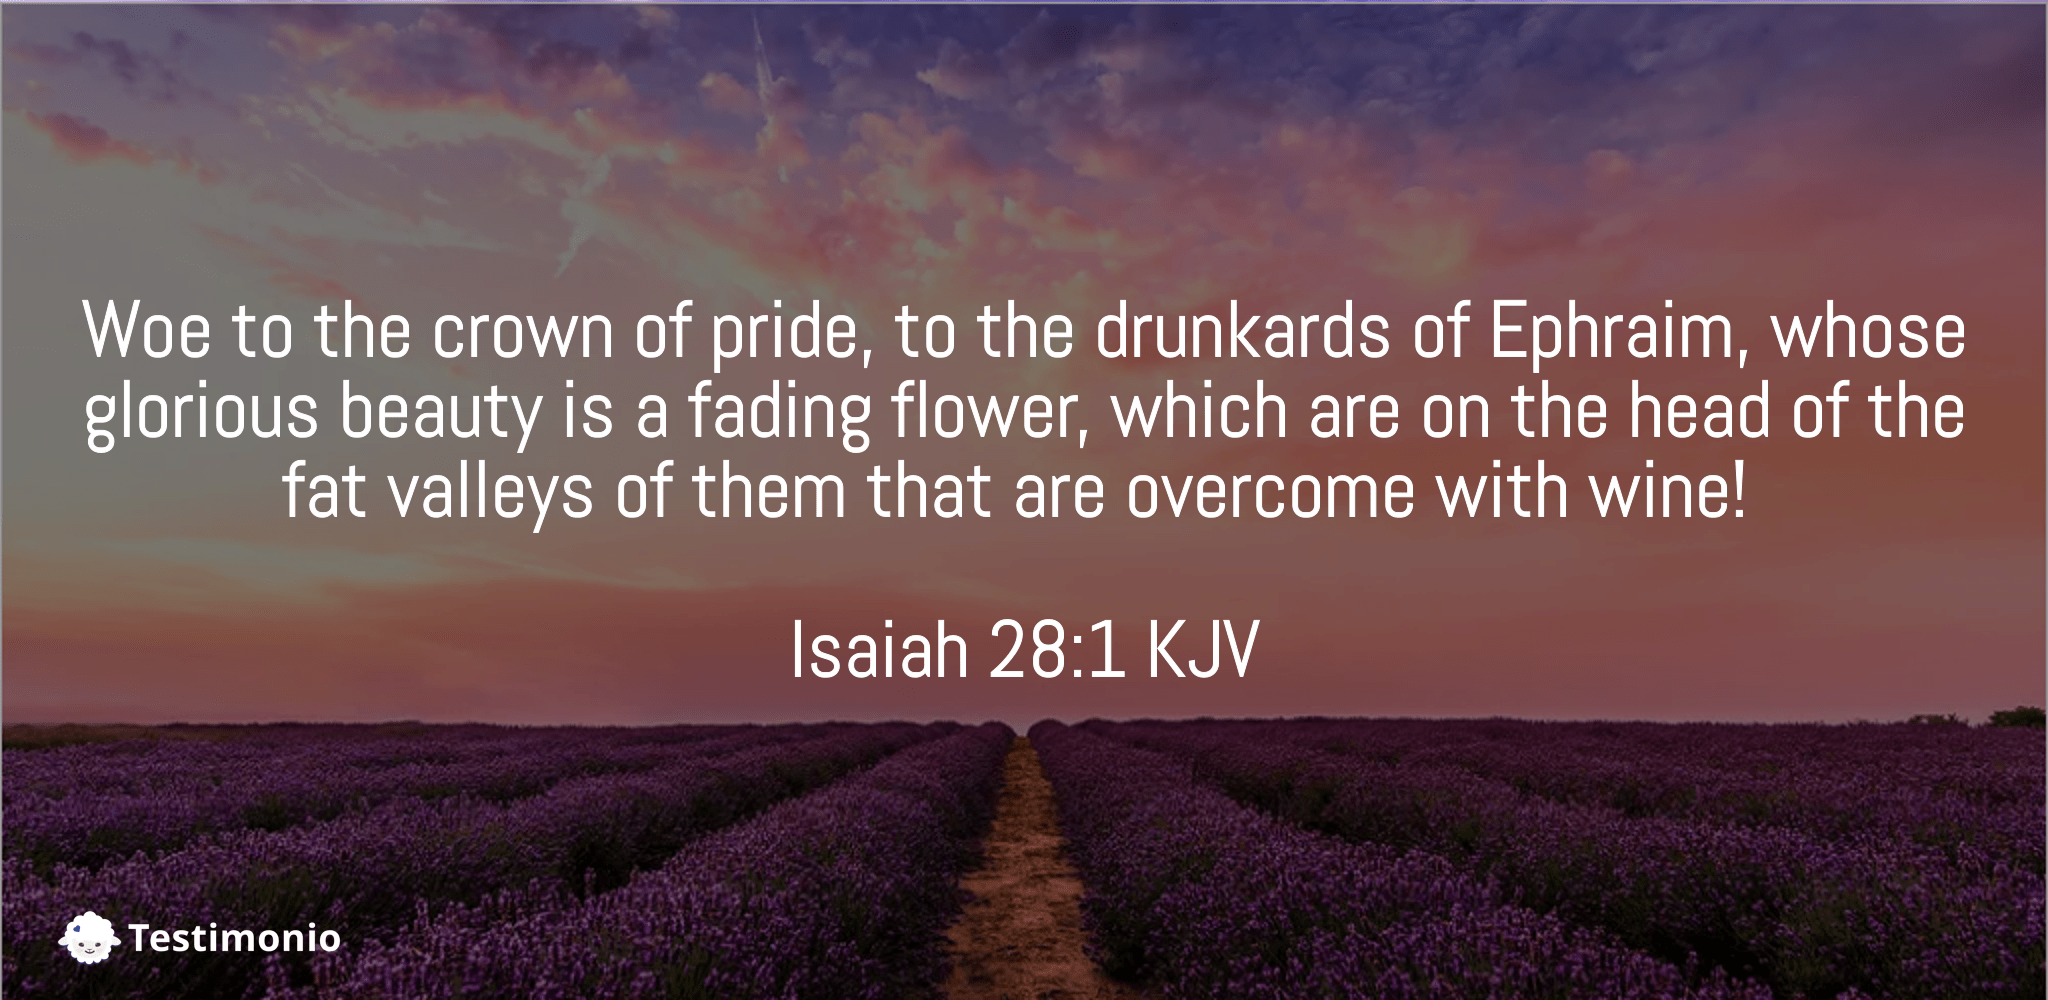 Isaiah 28:1